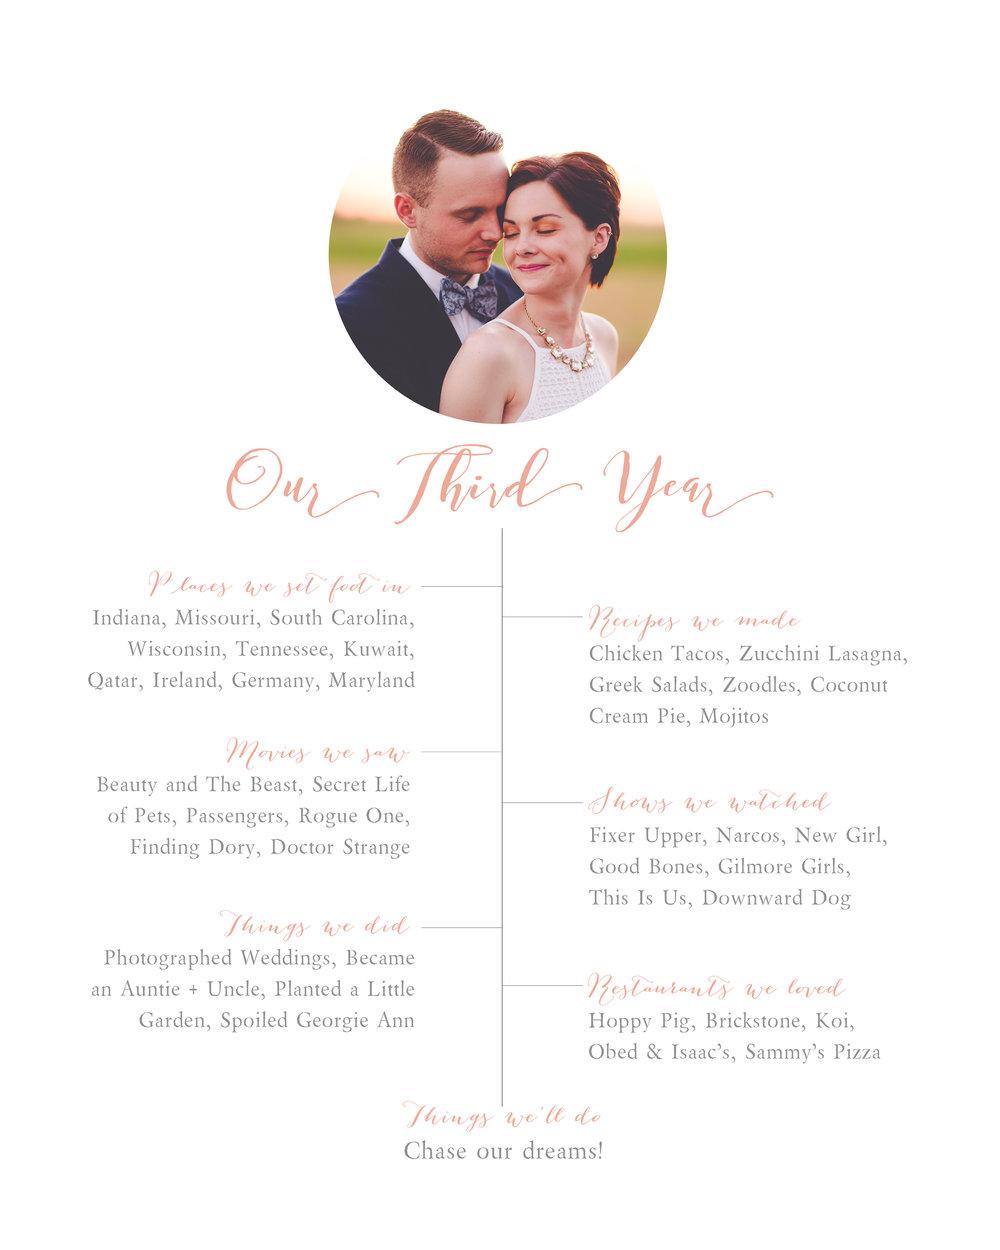 Kara Evans Photographer - Central Illinois Wedding Photographer - Wedding Wednesday Blog - Celebrating Our Third Year - Wedding Anniversary